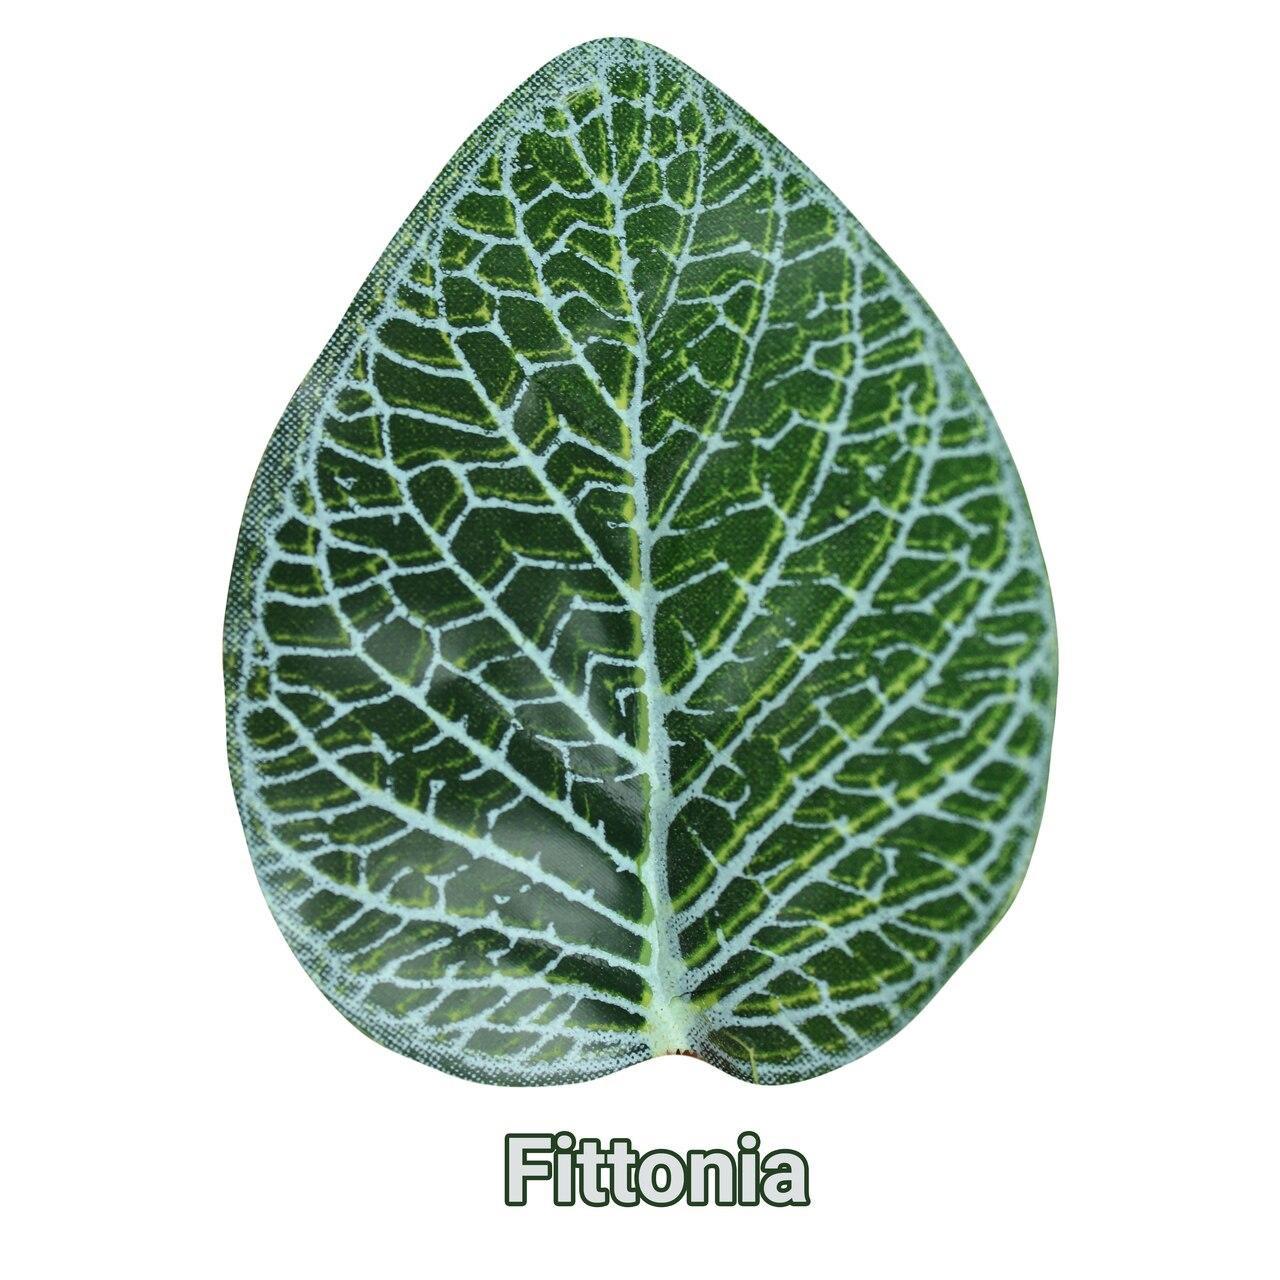 Pangea Pangea Hanging Bush 18 in Fittonia